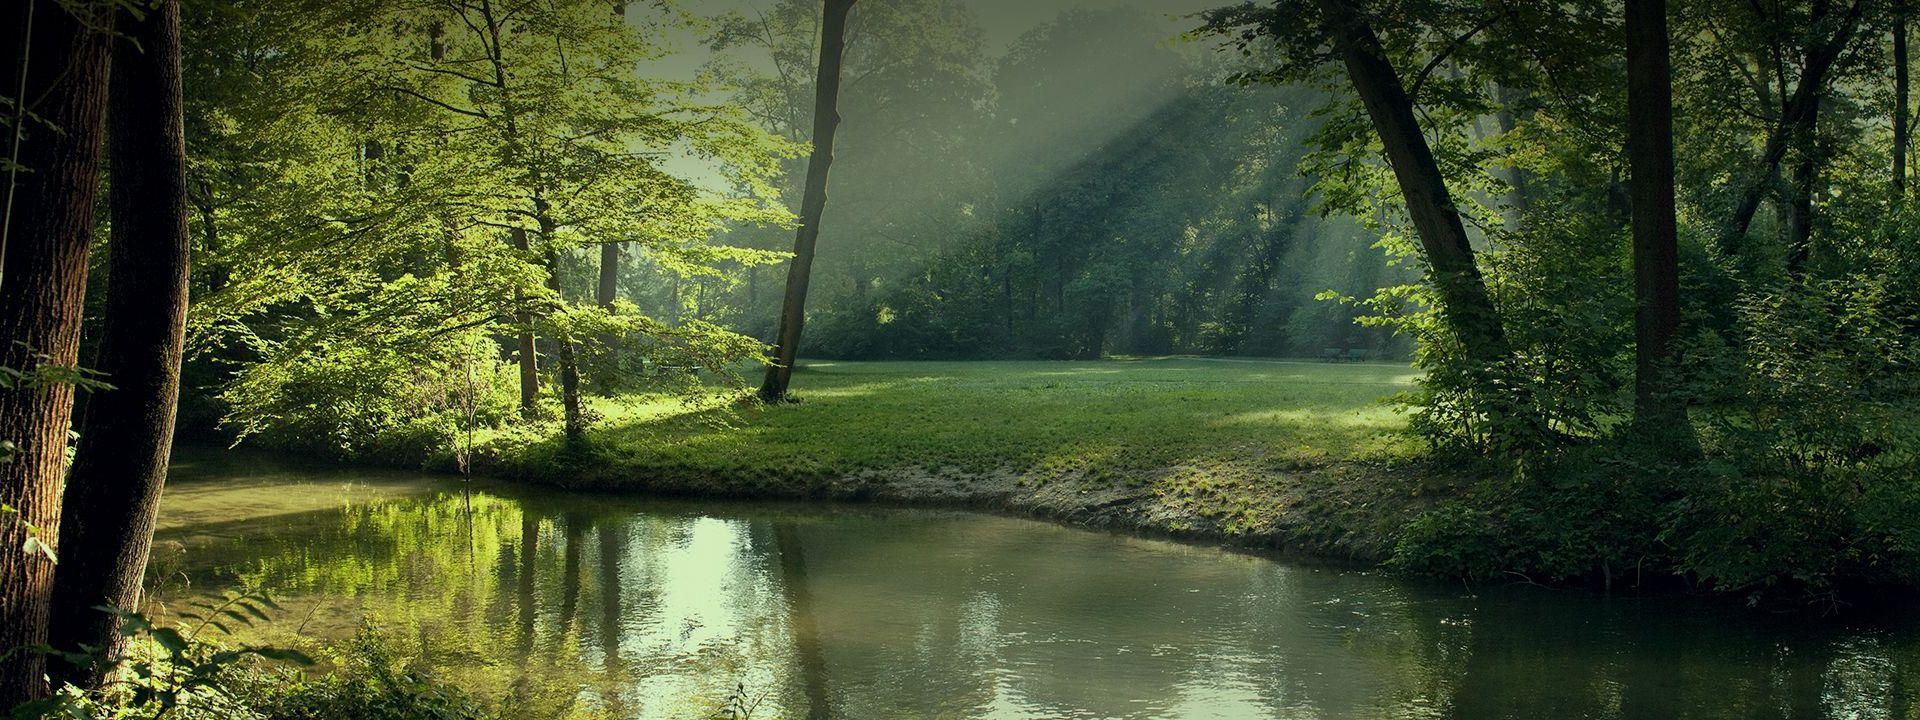 nature header image